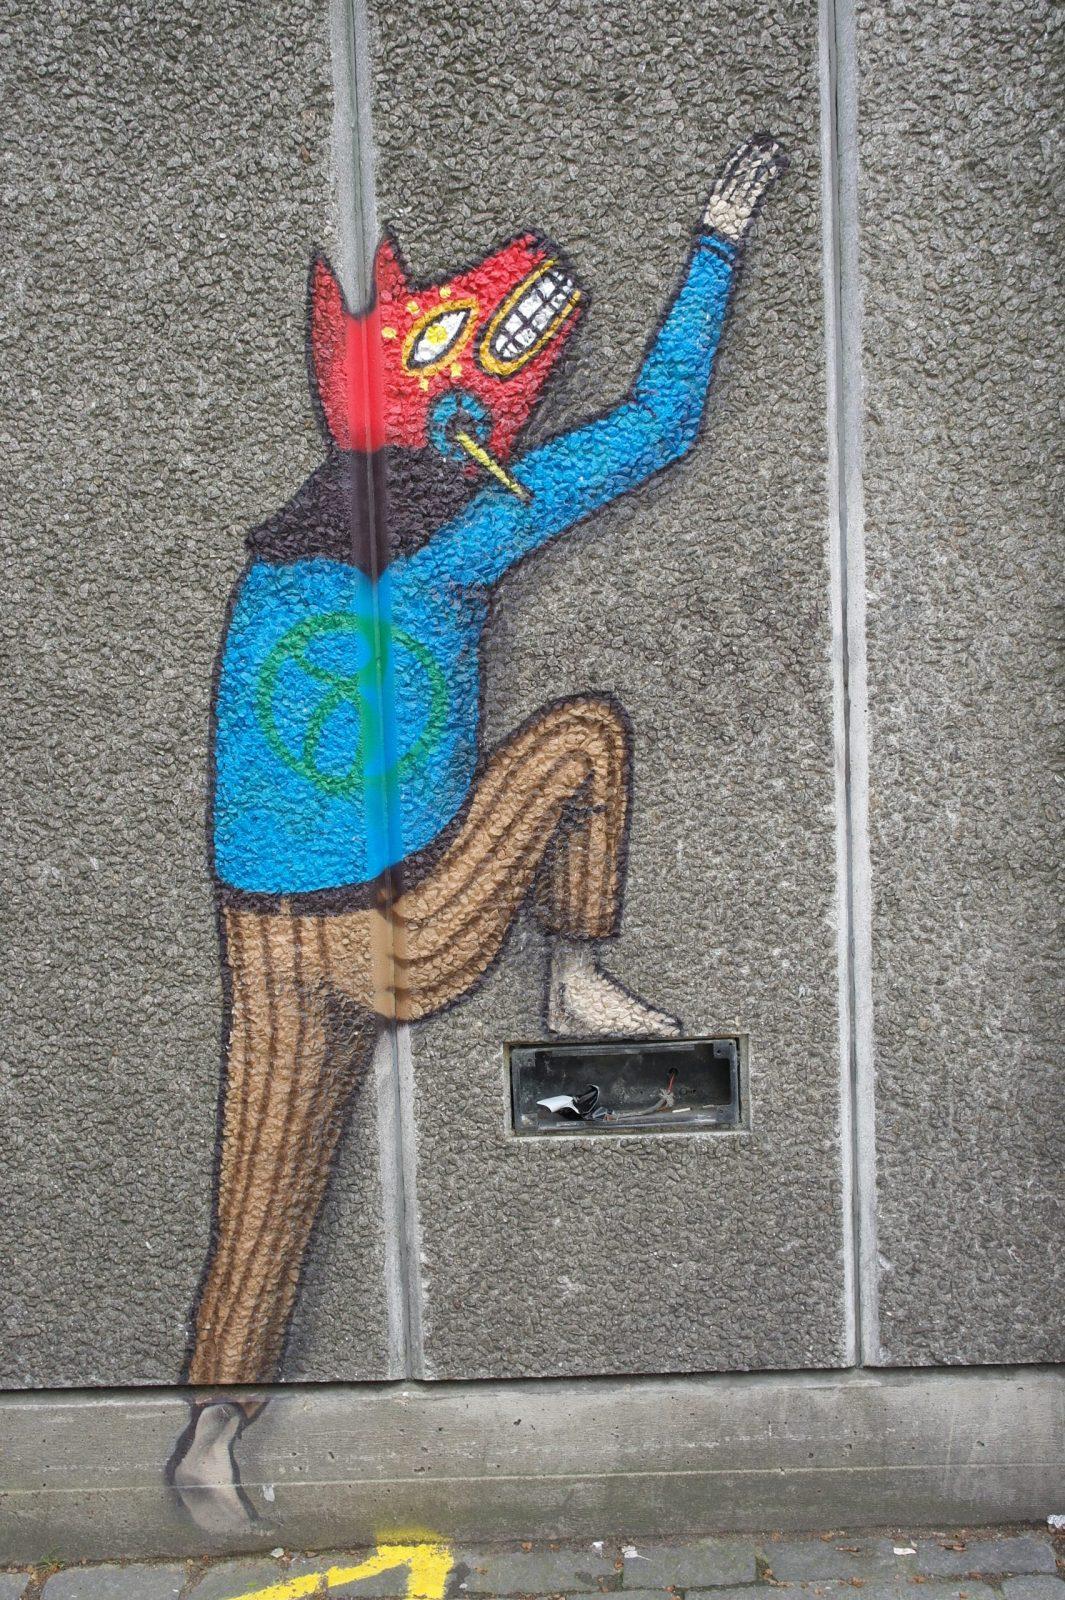 New Street Art in London: Alternative London Walking Tour Review 35